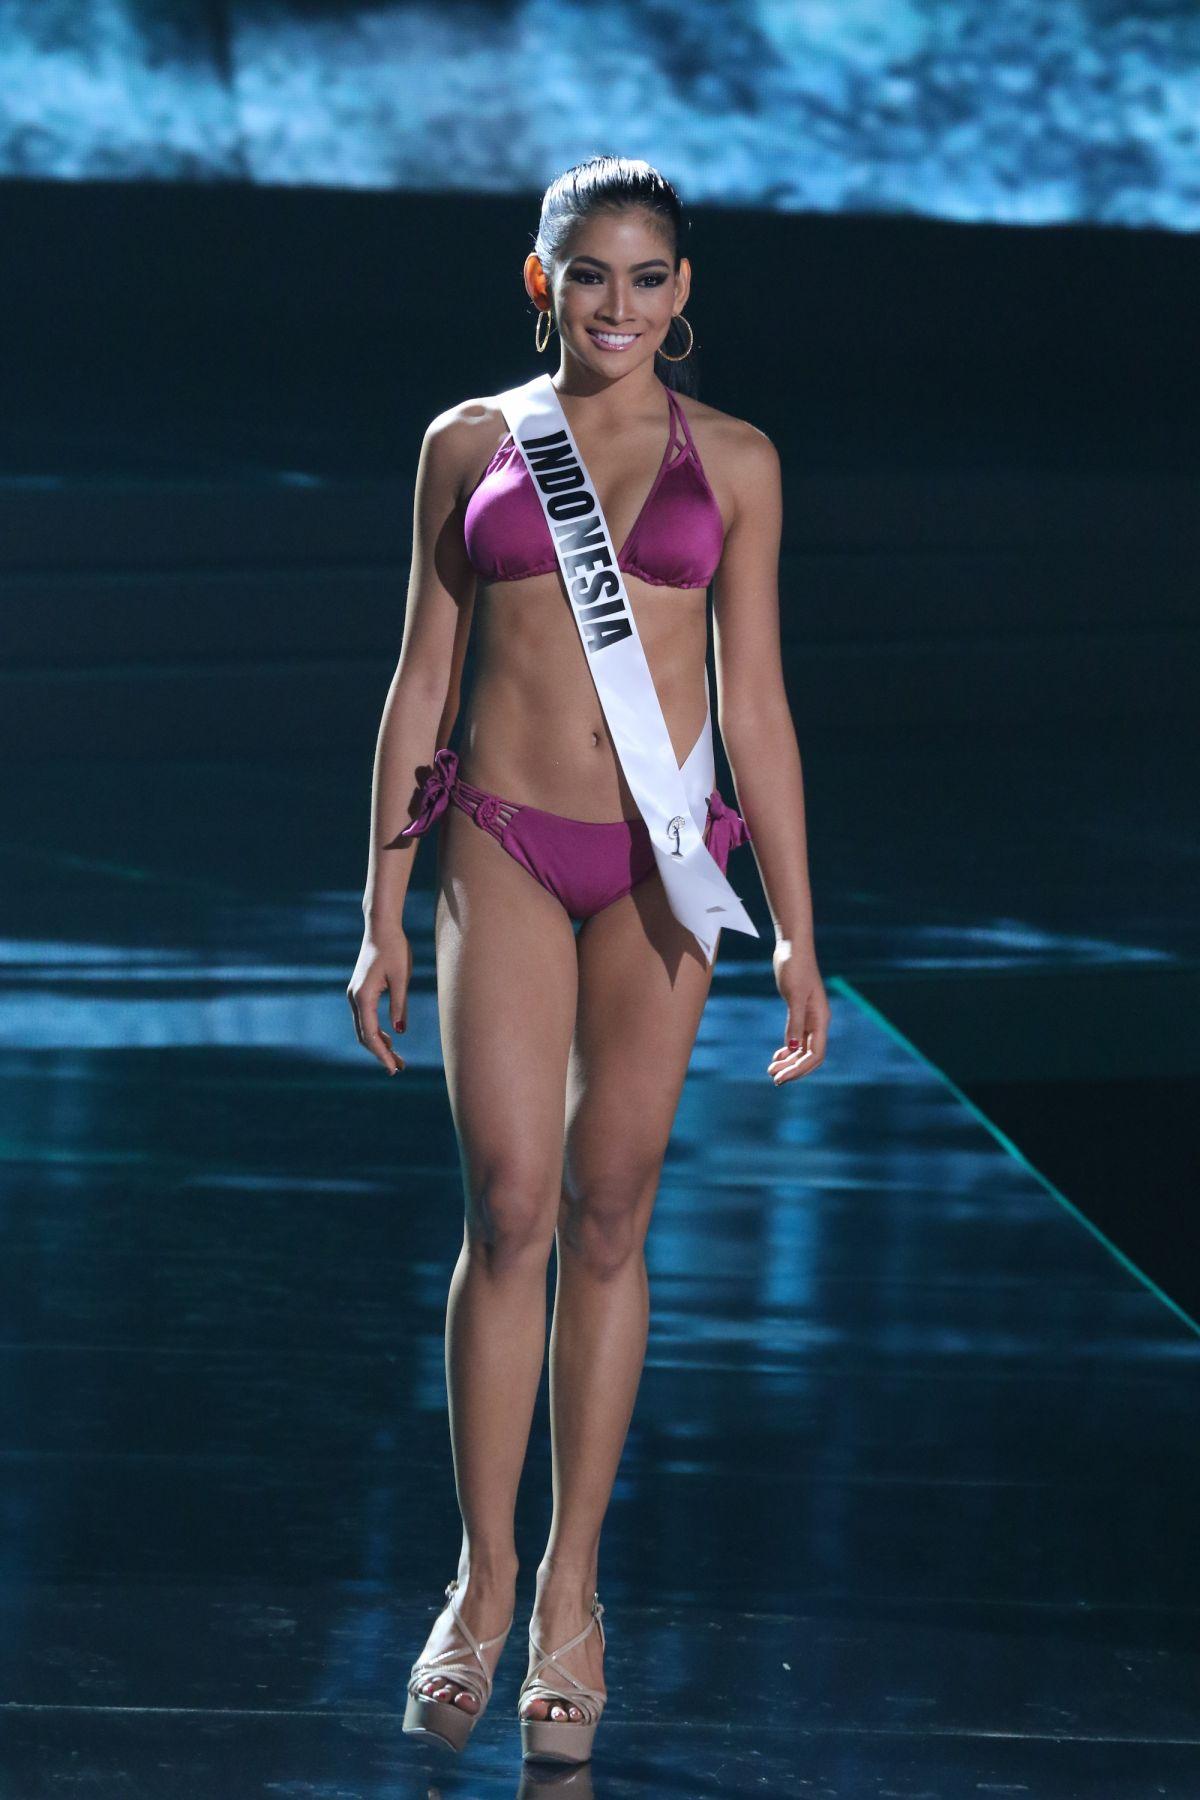 ANINYA PUTRI - Miss Universe 2015 Preliminary Round 12/16/2015